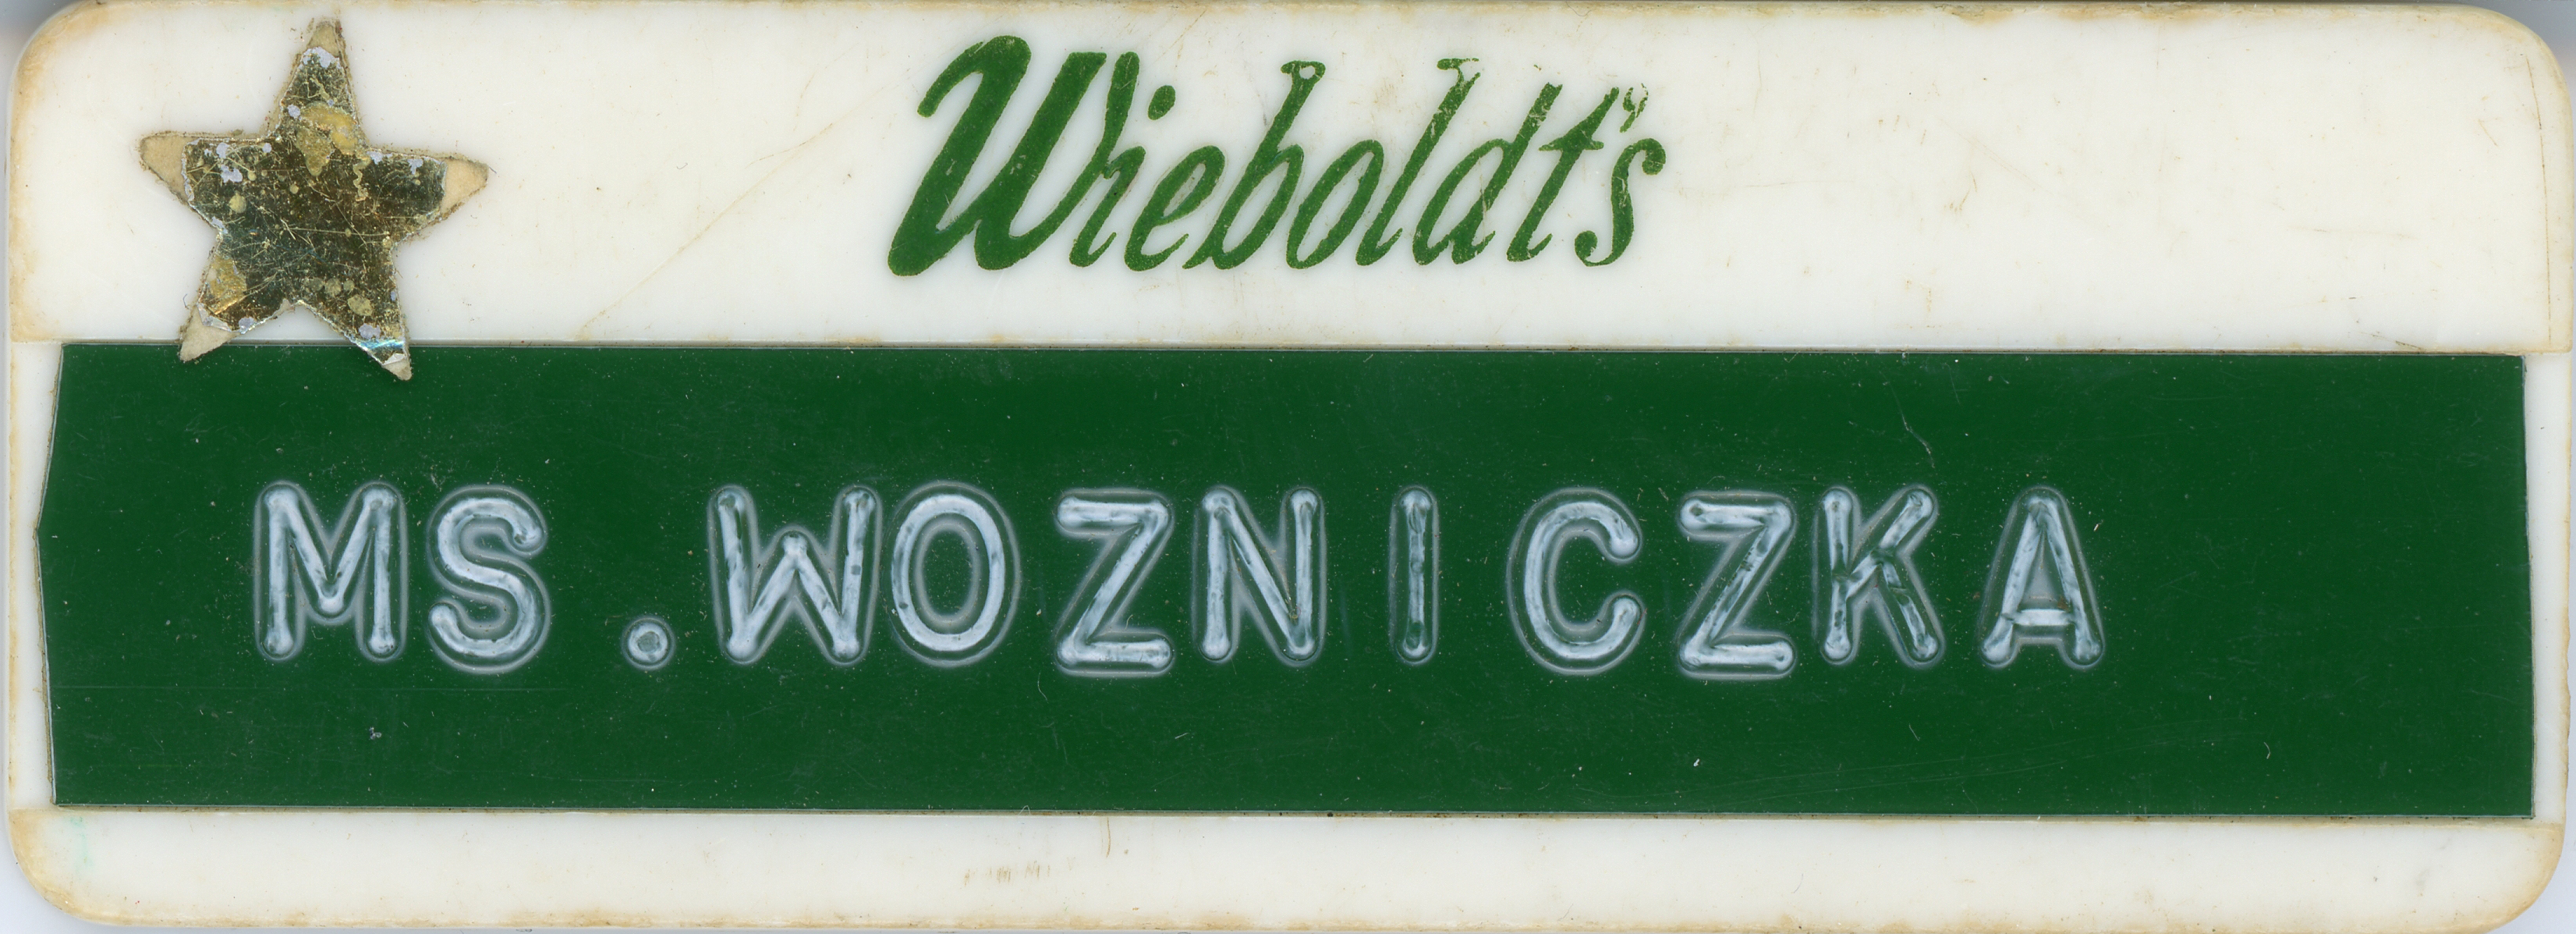 Lakehurst Wieboldt's nametag